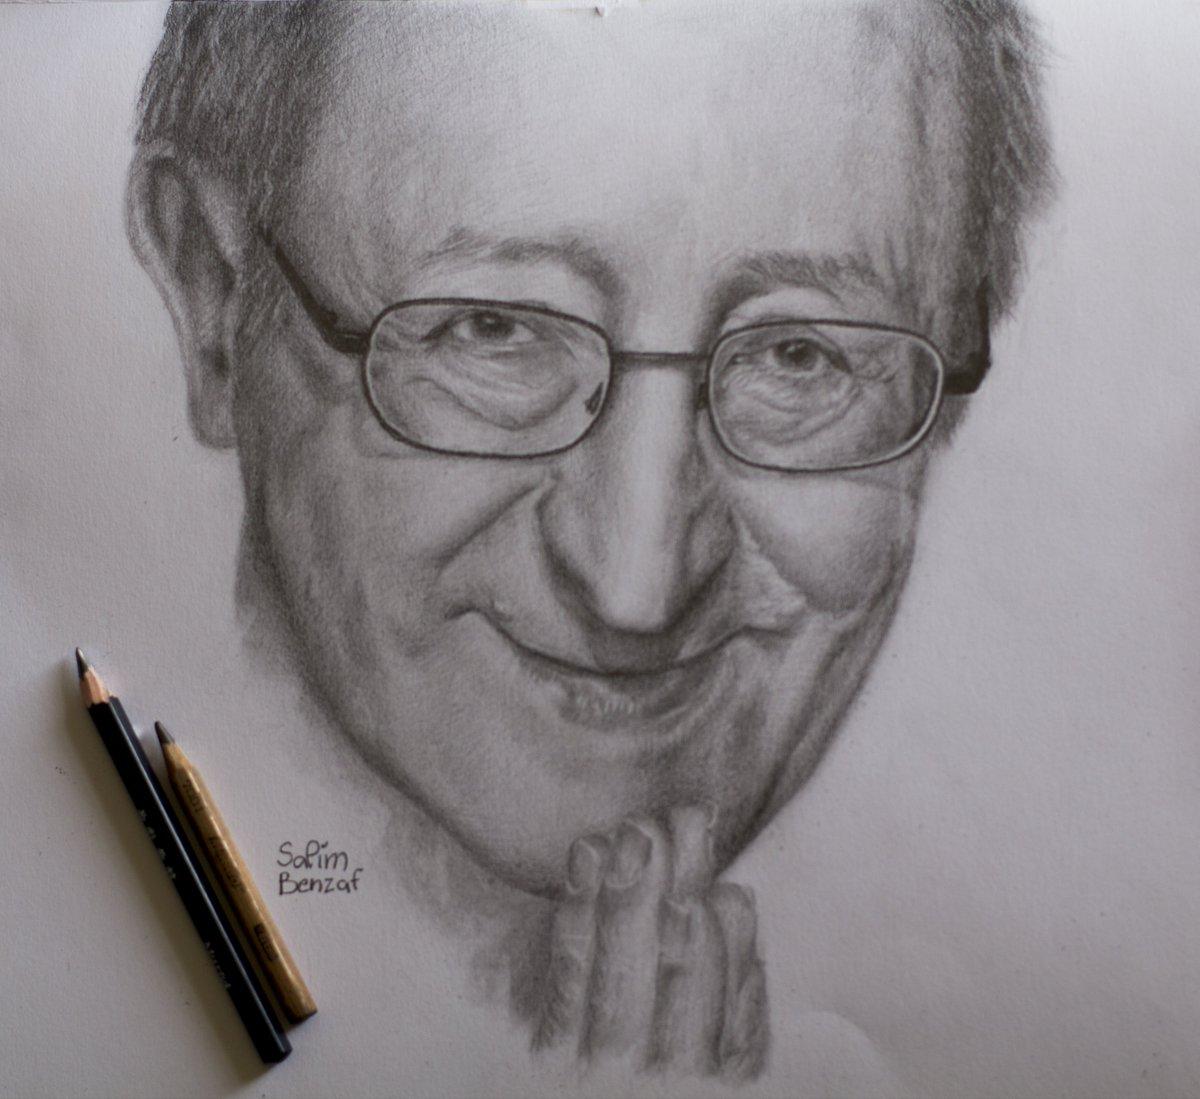 "My new drawing . ""Idir"" I hope you like it #drawing #pencil #Pencildrawing #Pencilchallenge #pencilart #pencilsketch #art #idir #salimbenzafpic.twitter.com/ctf6YyvmtG"